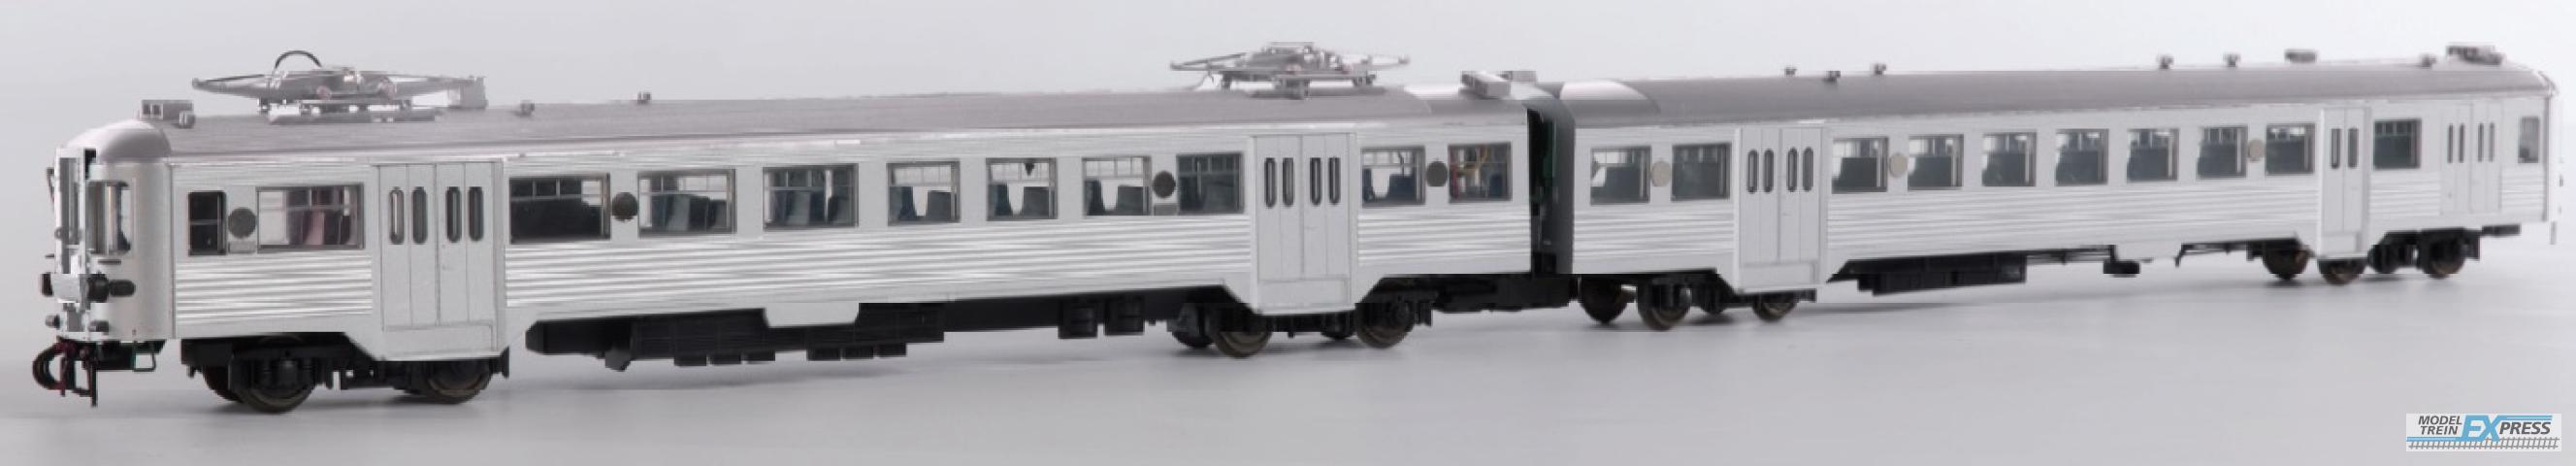 B-Models 7101.01L